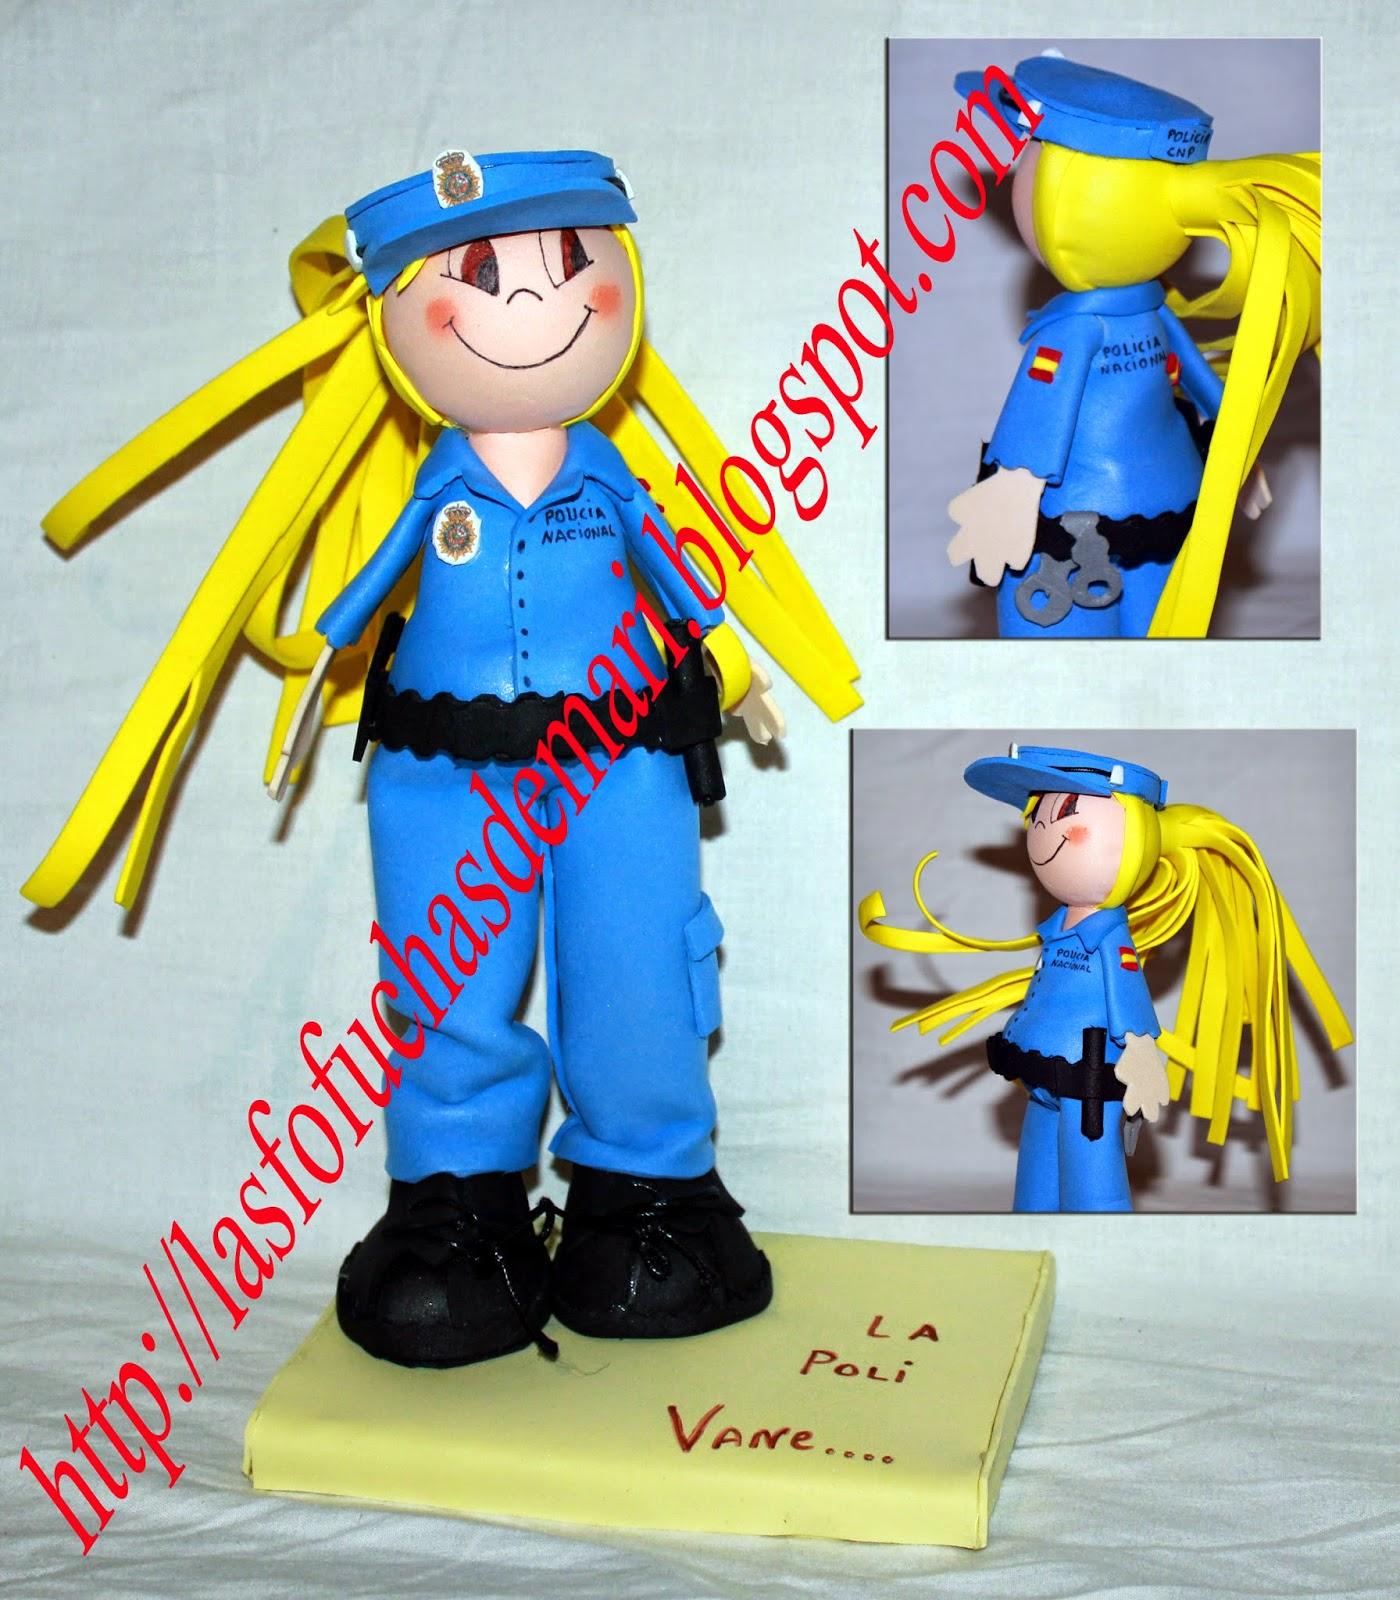 Policía Nacional - Vane